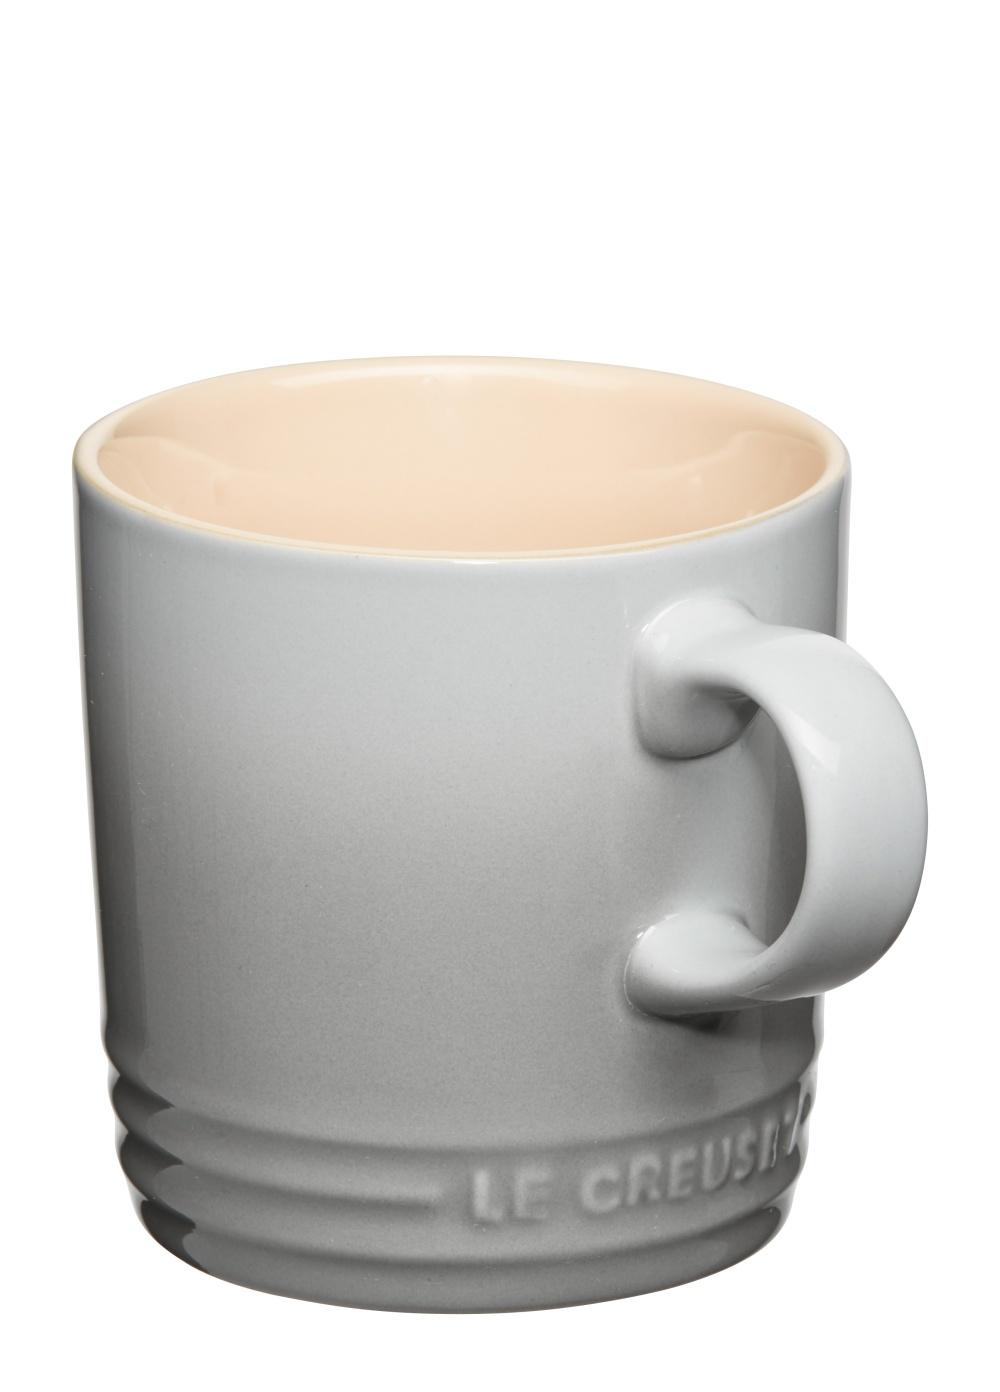 Becher 350ml Perlgrau Poterie Le Creuset